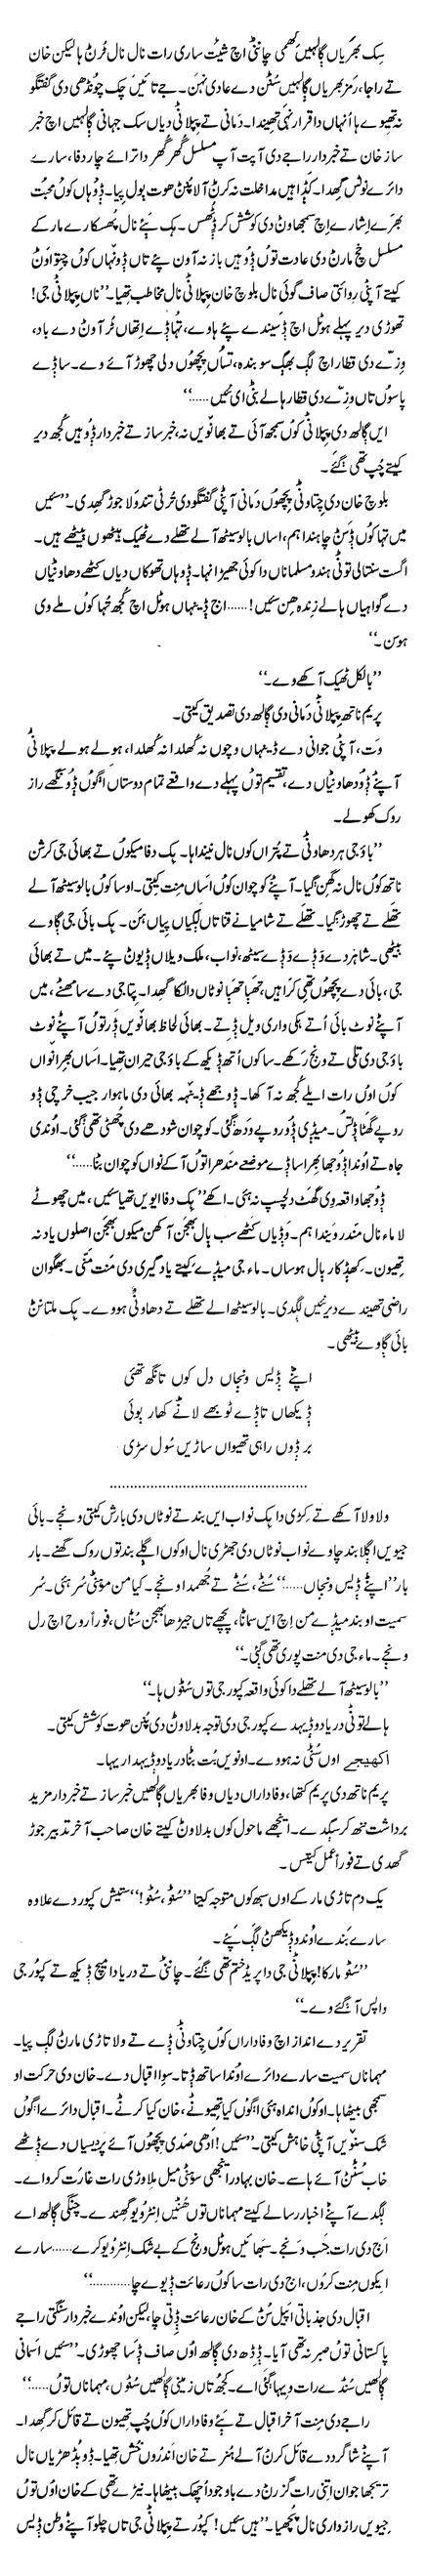 Seraiki Afsana Dais Poja (Mazar Lashari) Part-3